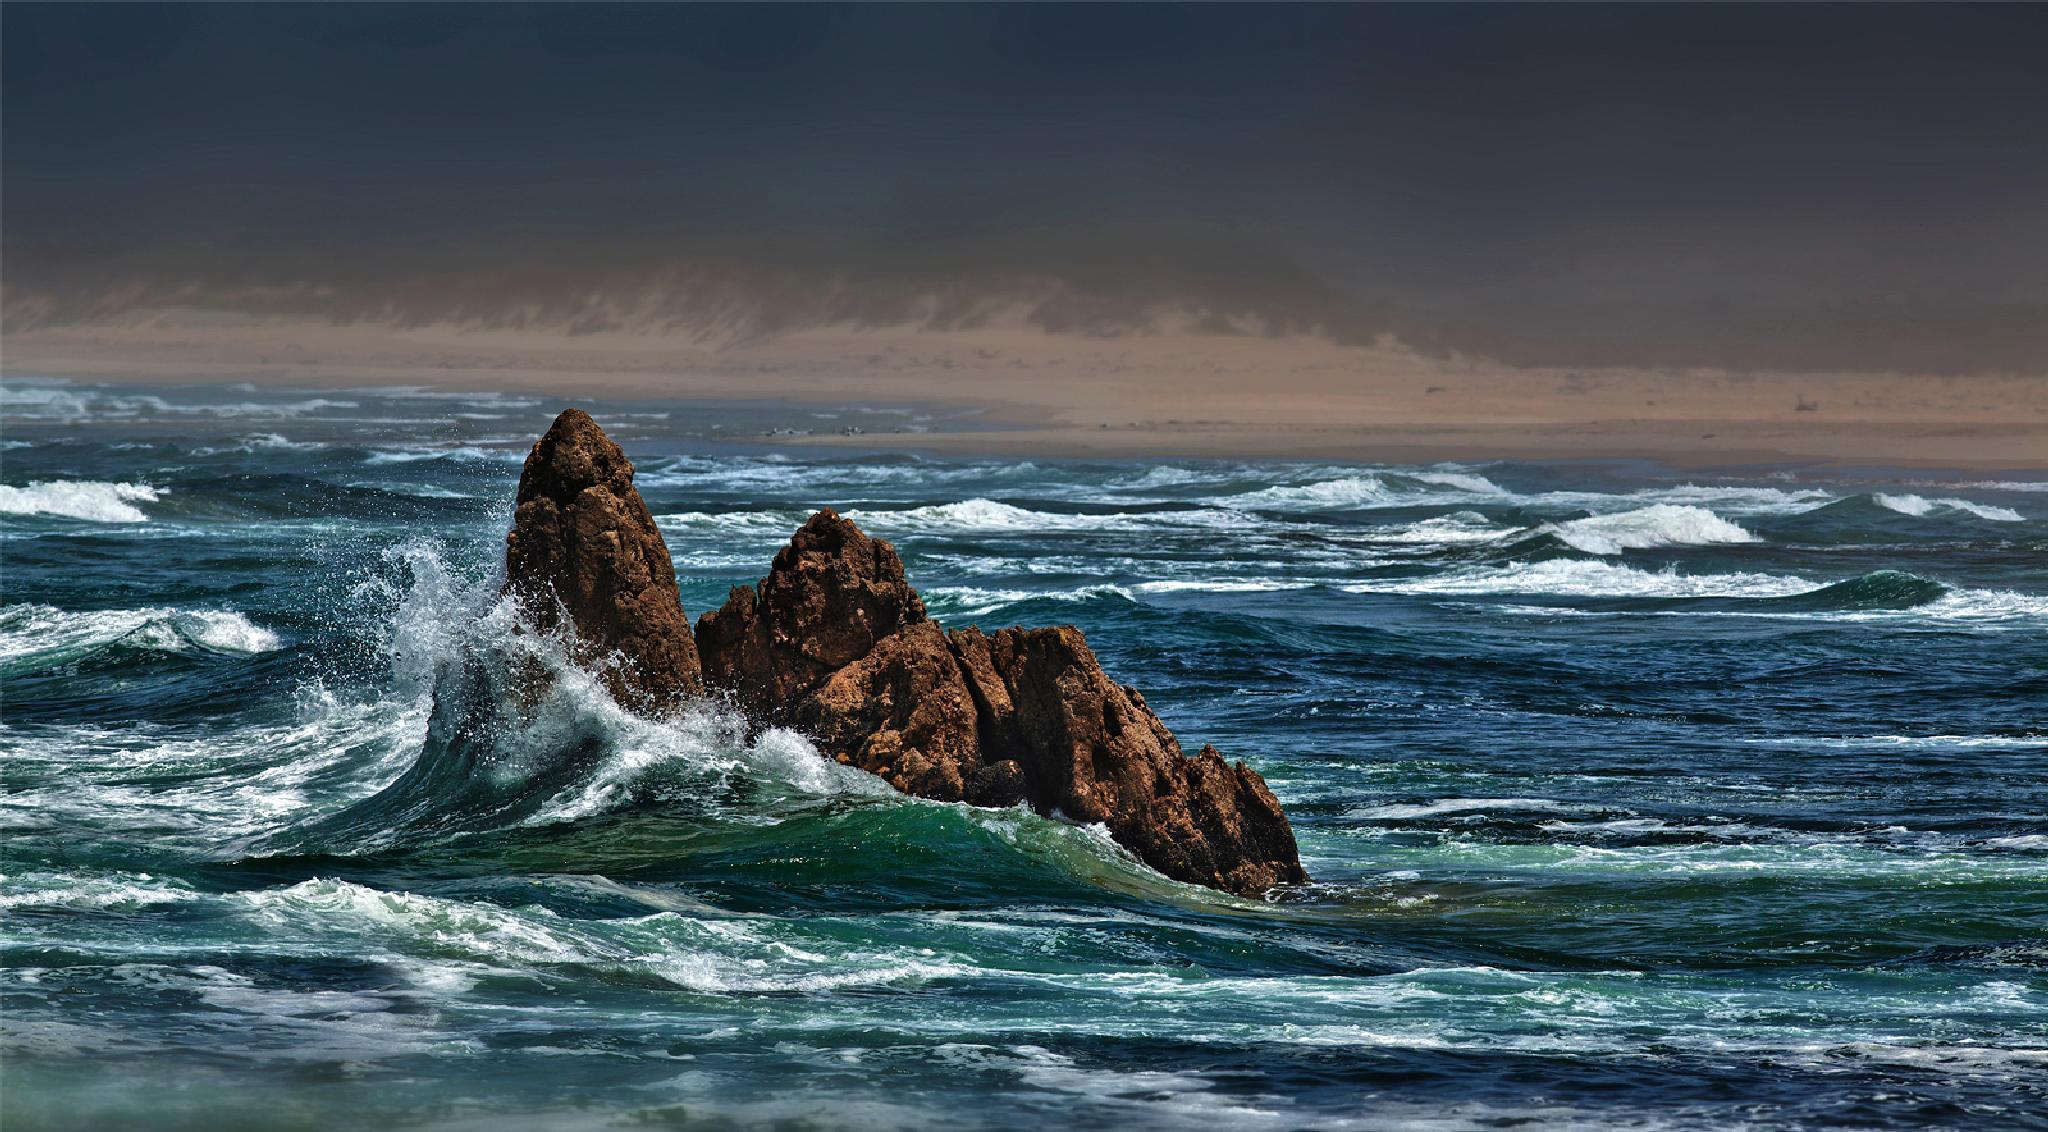 Brenton on Sea by GeorgeVeltchev